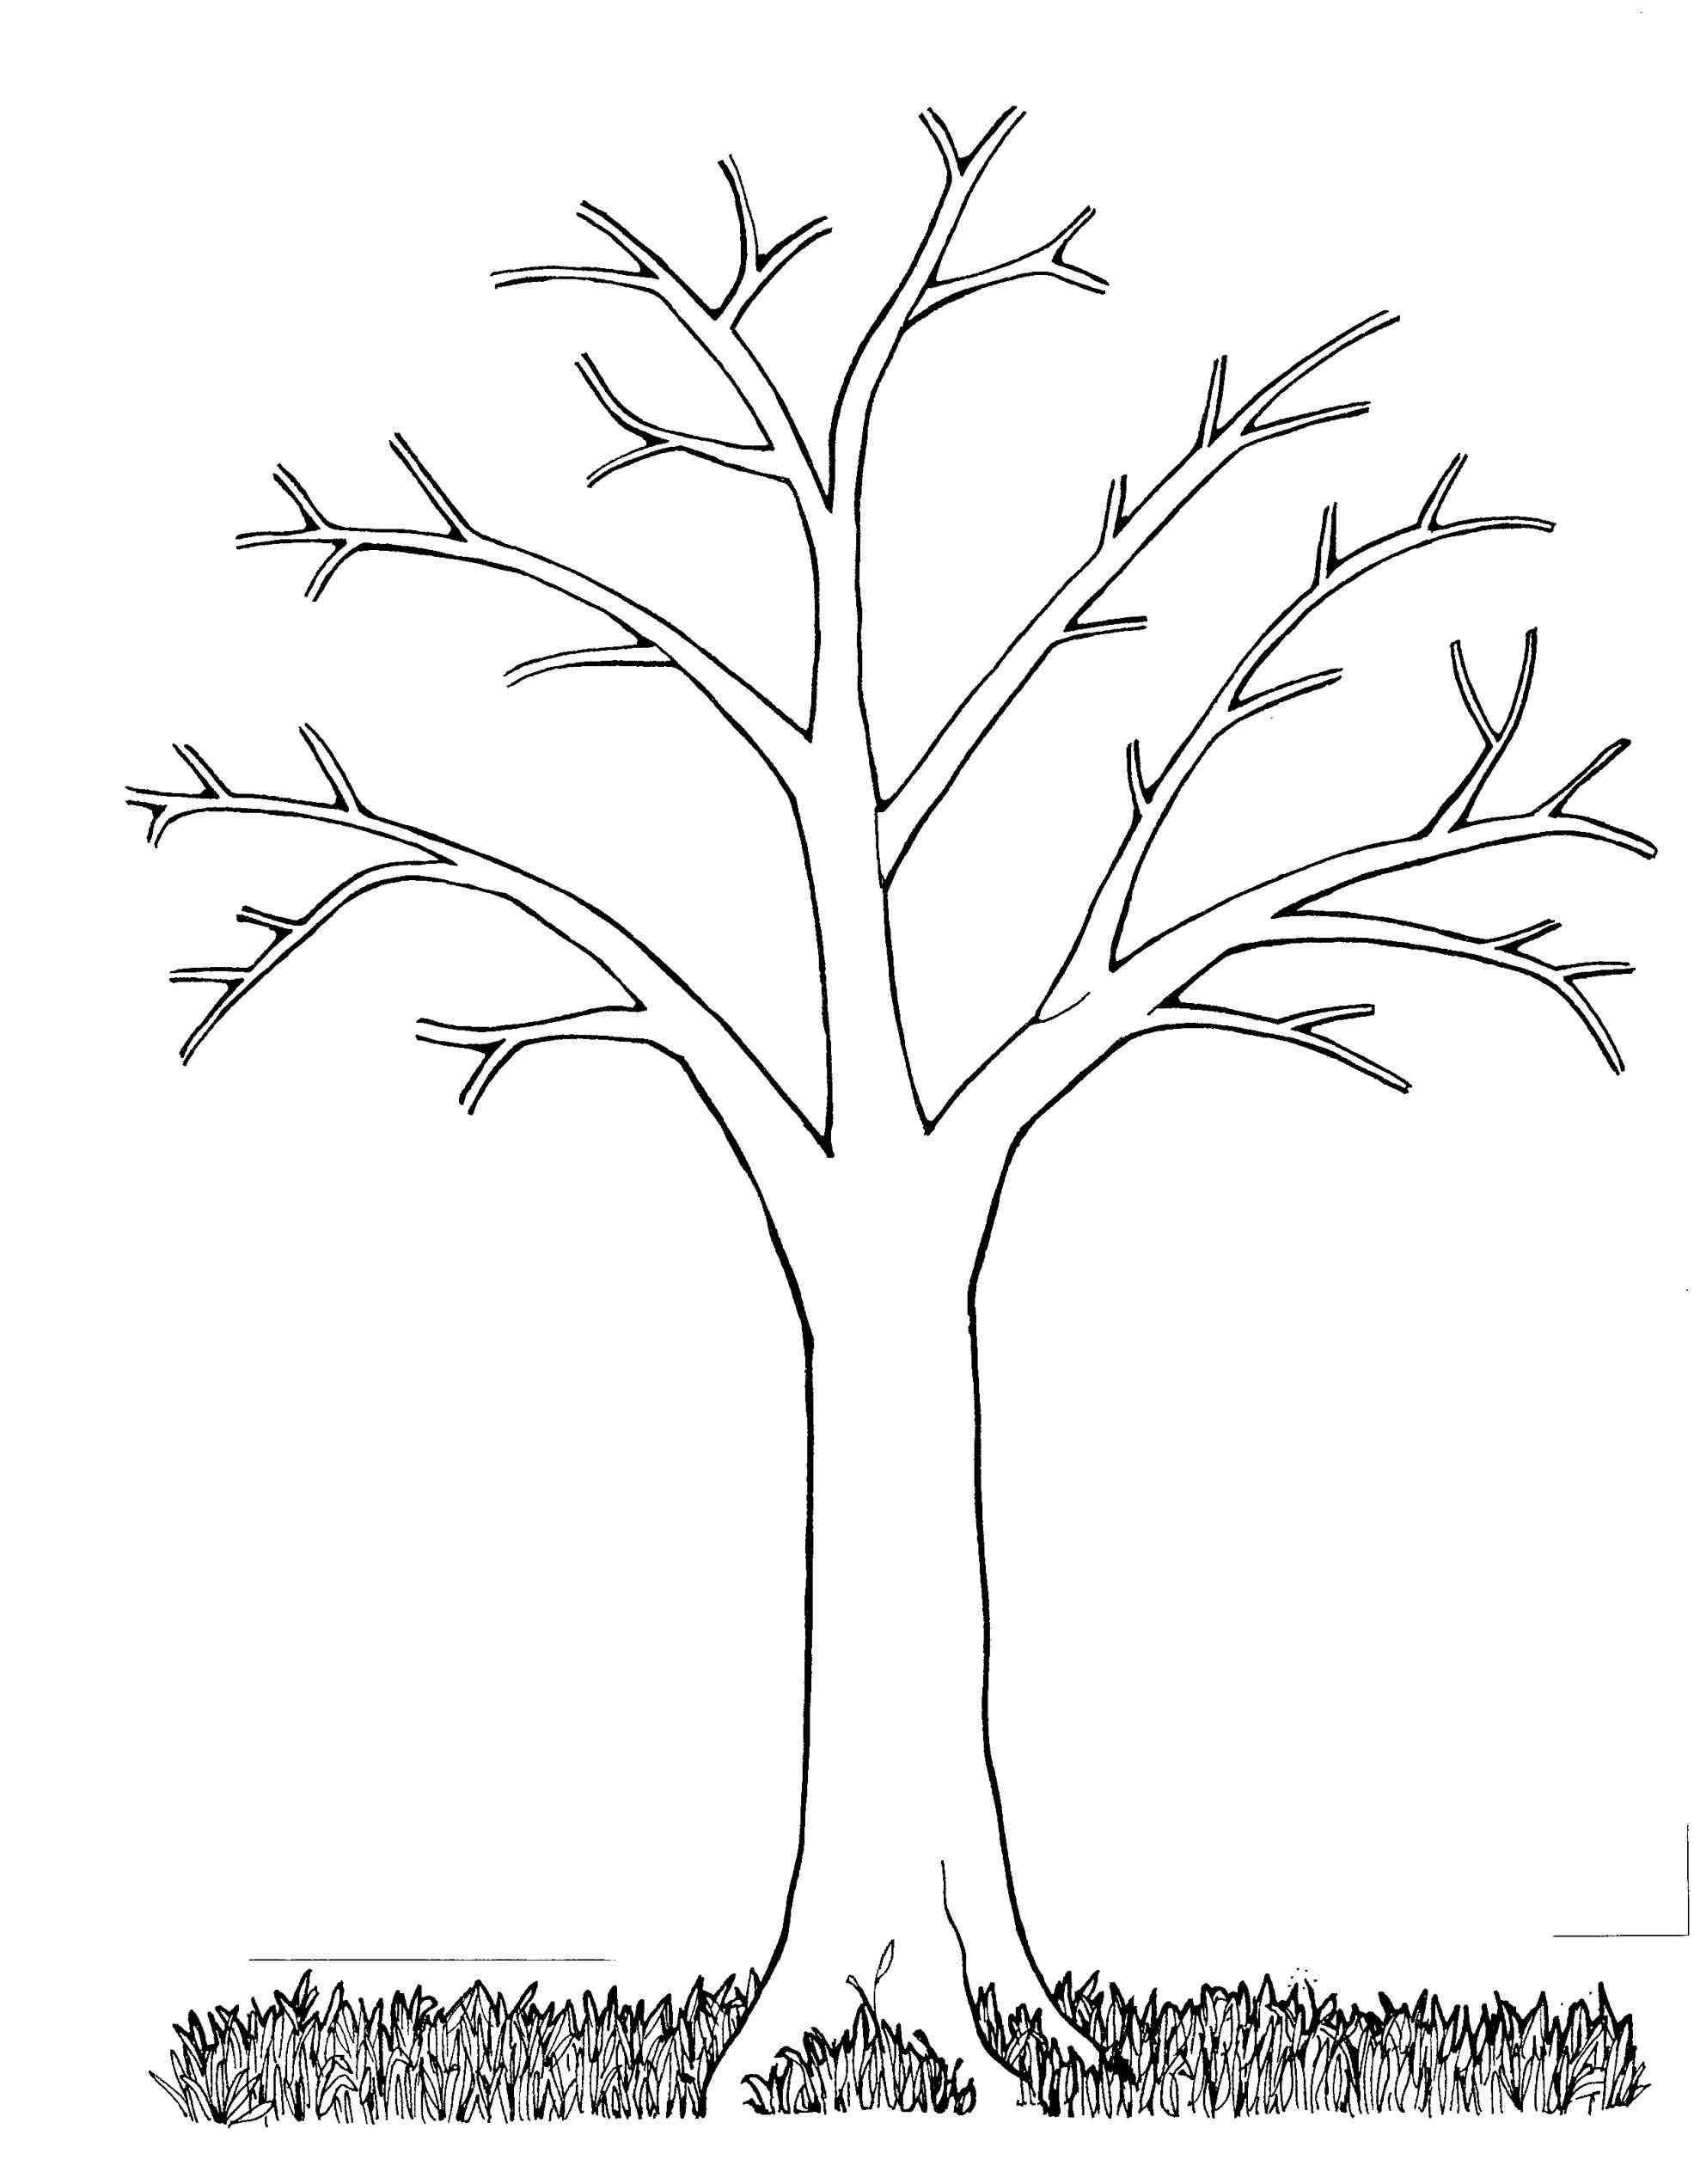 Poplar tree clipart black and white.